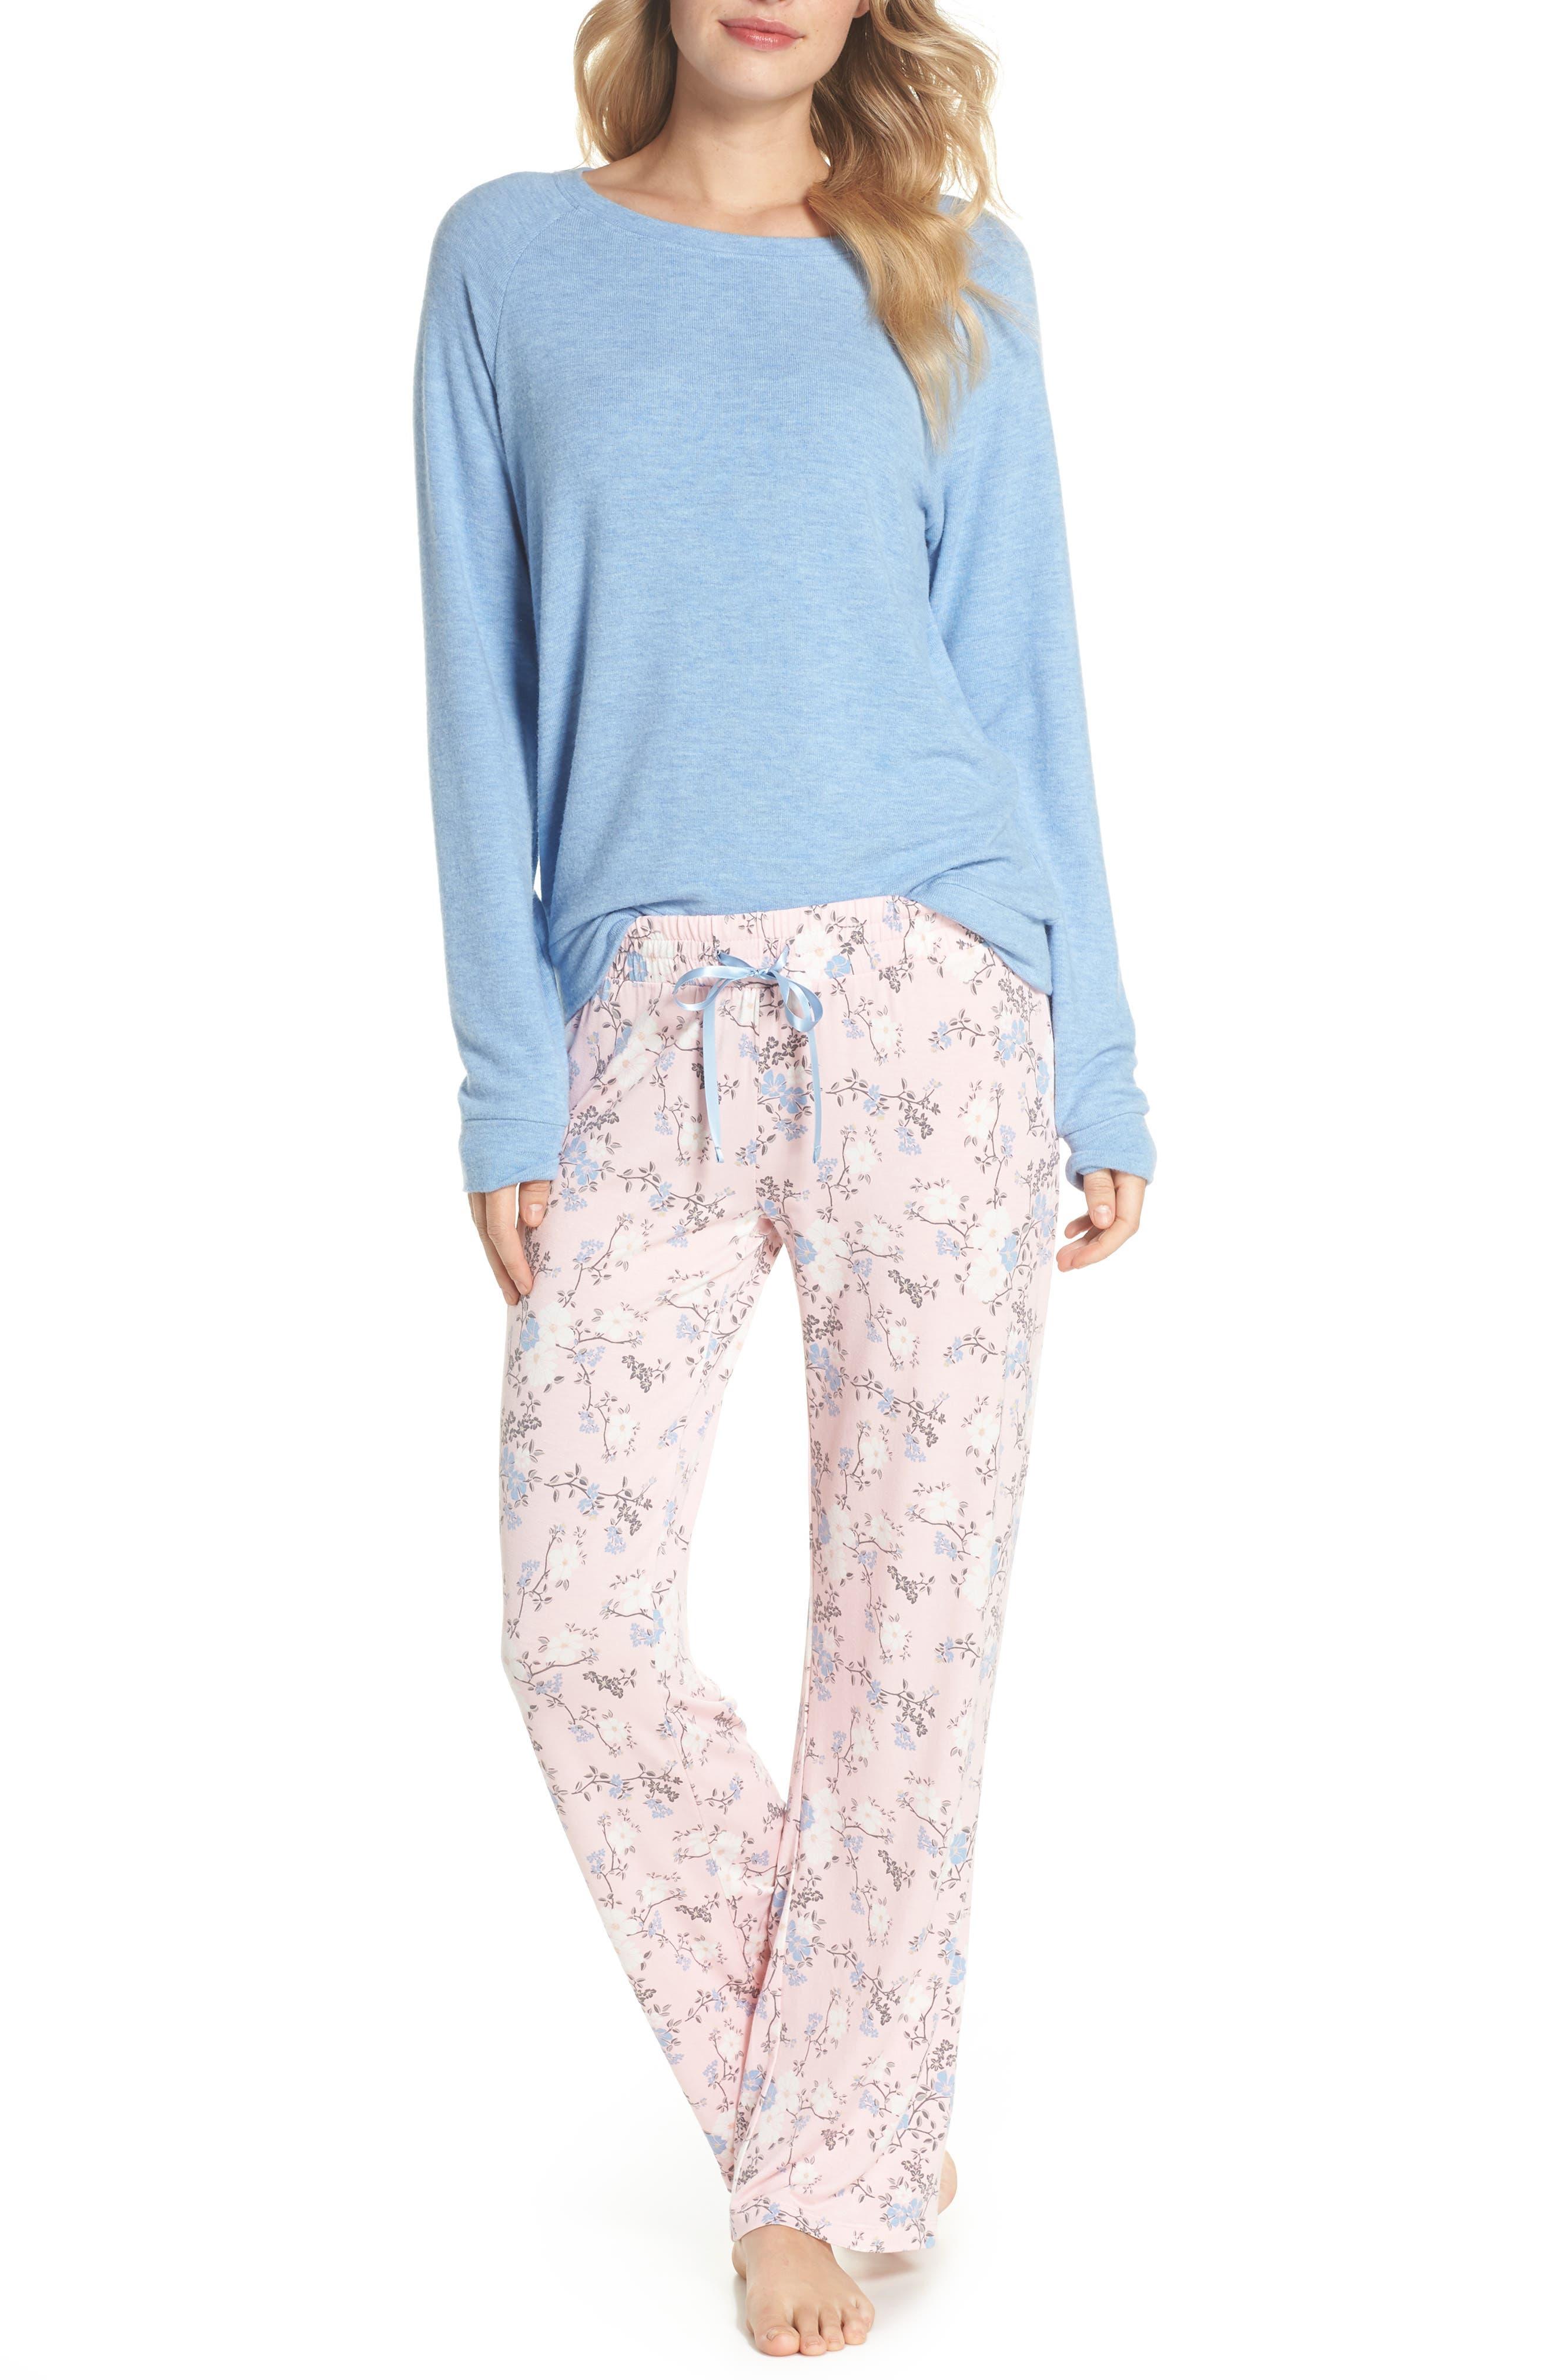 Peachy Pajama Shirt,                             Alternate thumbnail 6, color,                             Blue